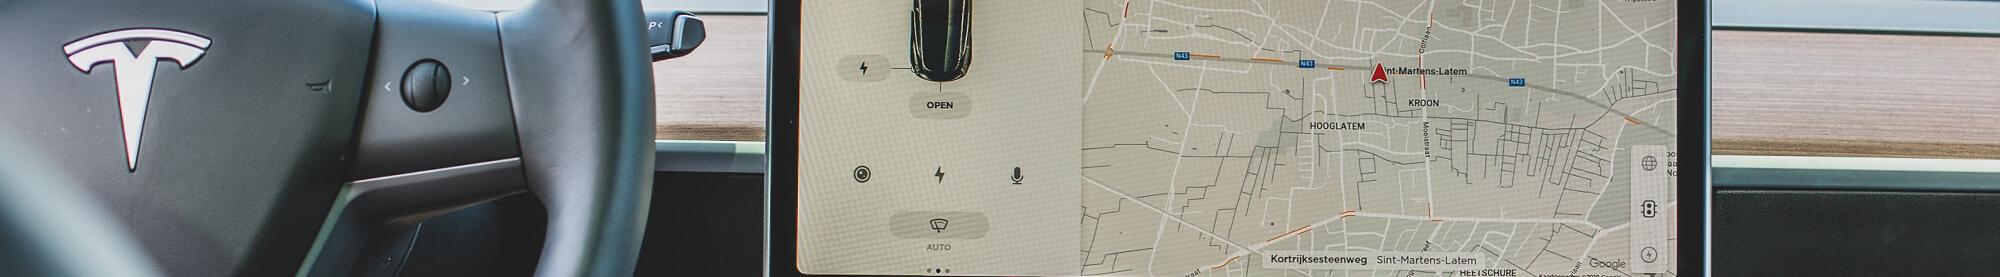 Tesla Autopilot Touchscreen